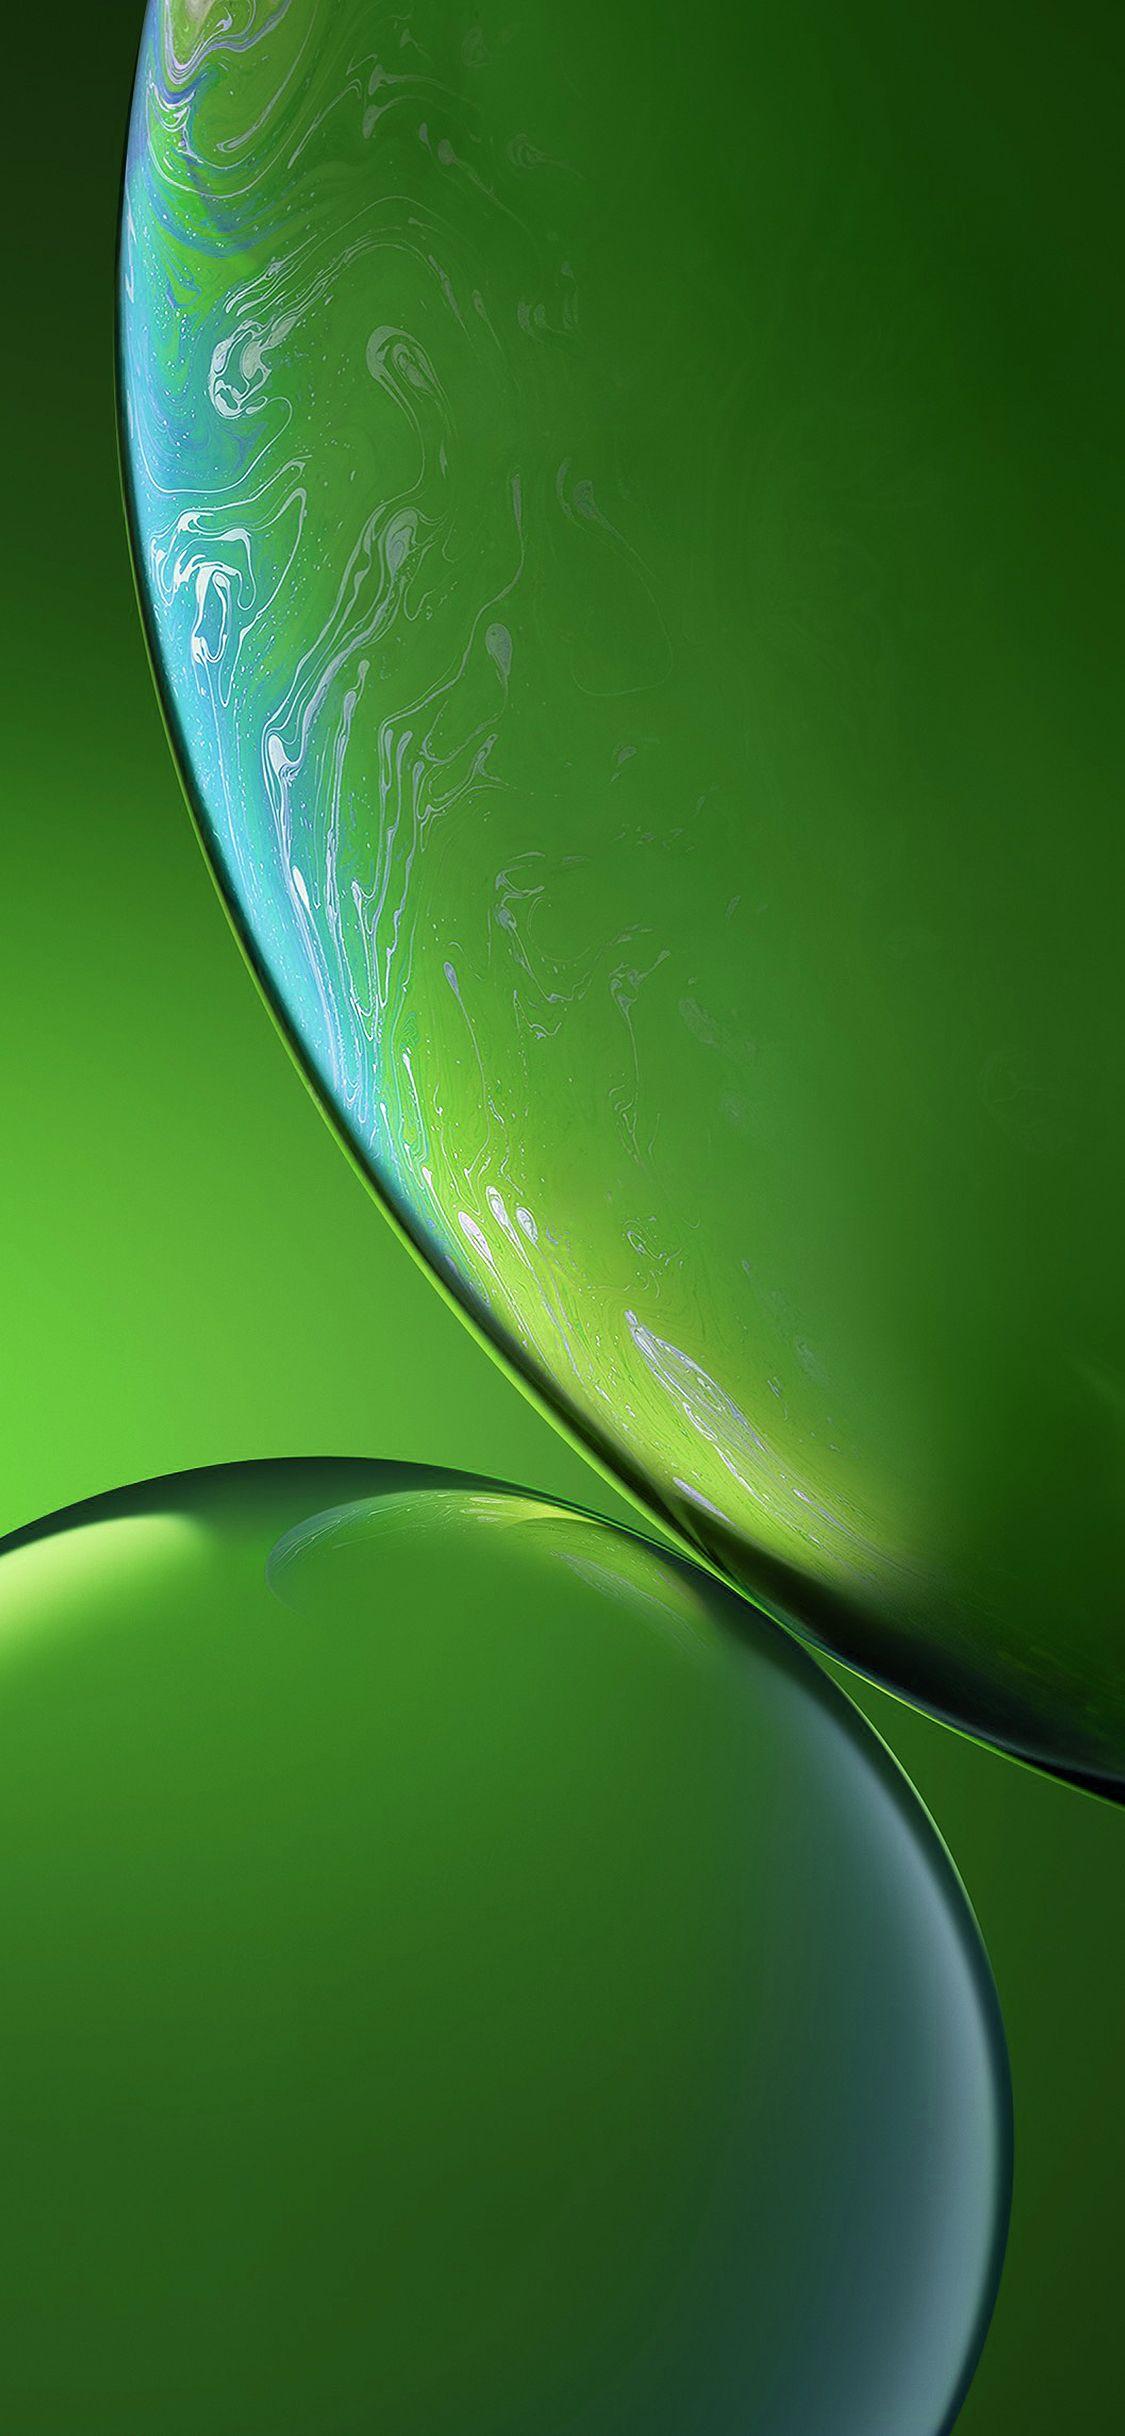 Iphone Xr Bonus The Missing Color Green Wallpapers Central Green Wallpaper Apple Wallpaper Iphone Wallpaper